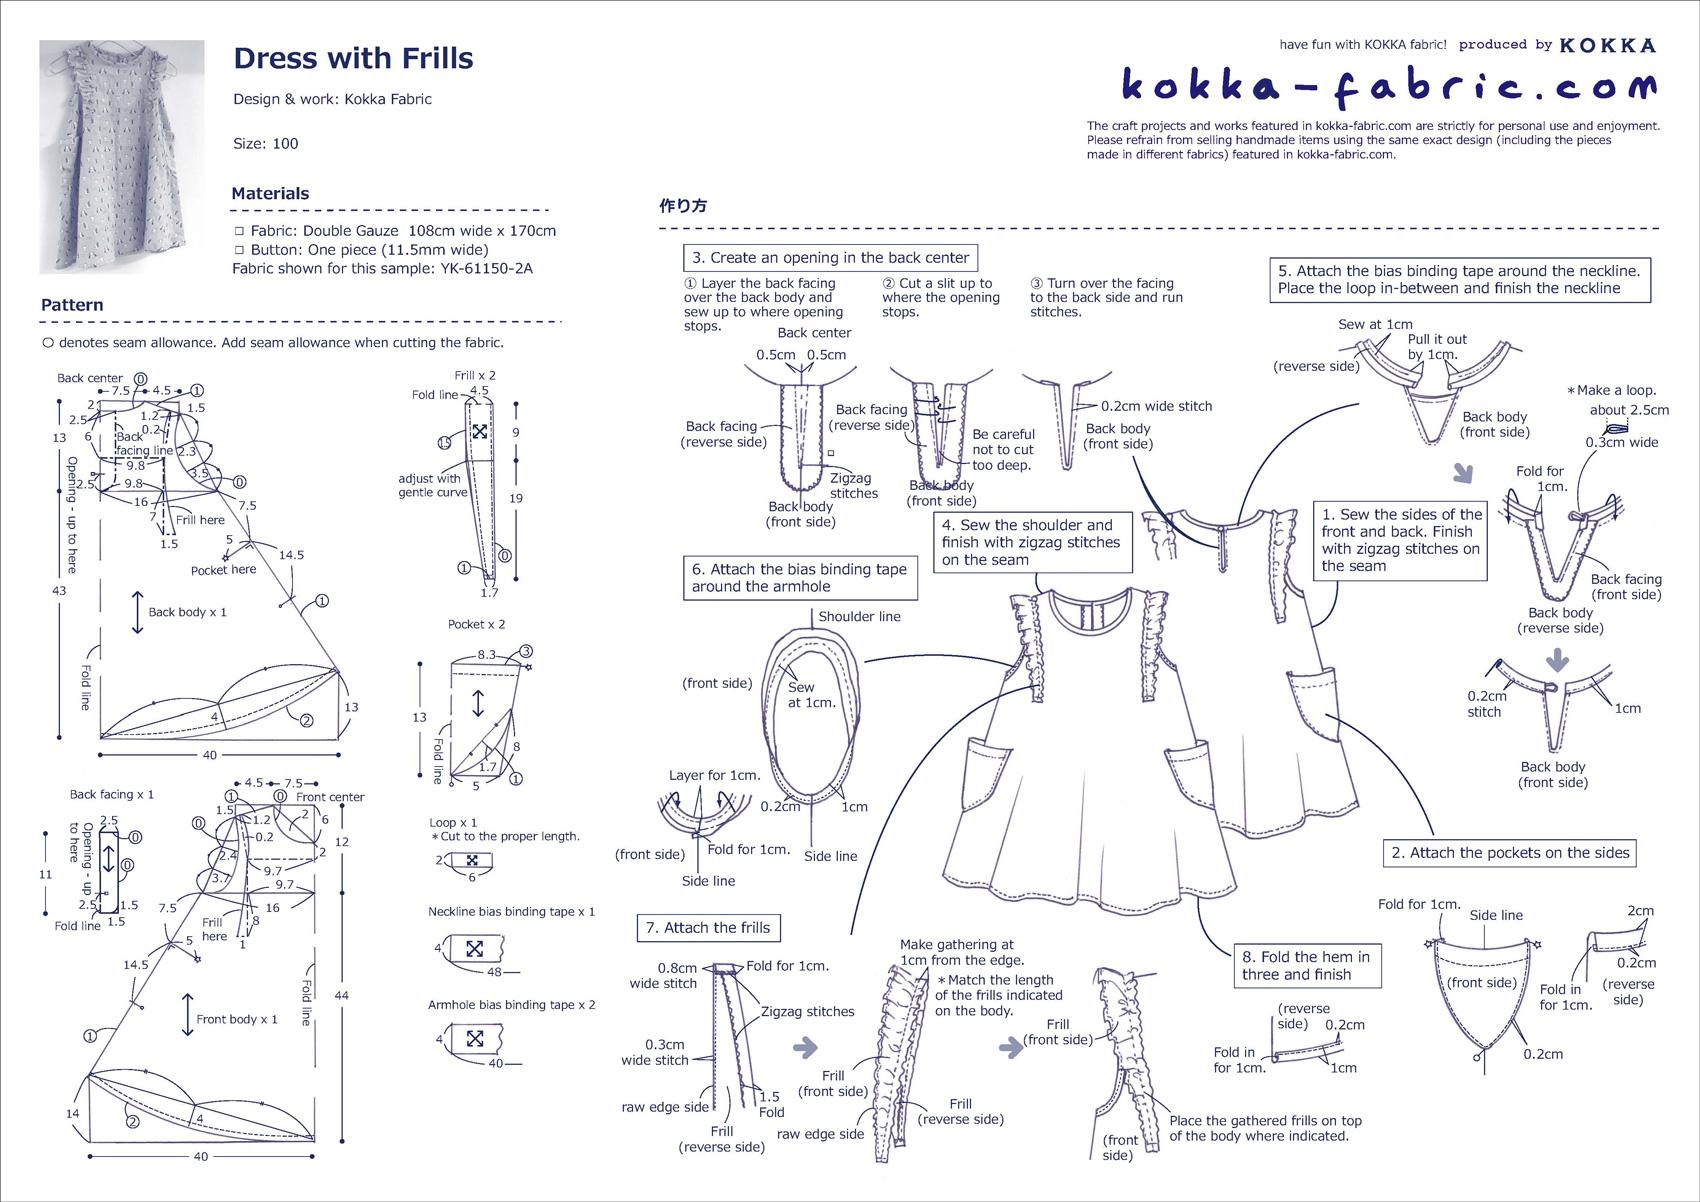 CS308_Dress-with-Frills_E